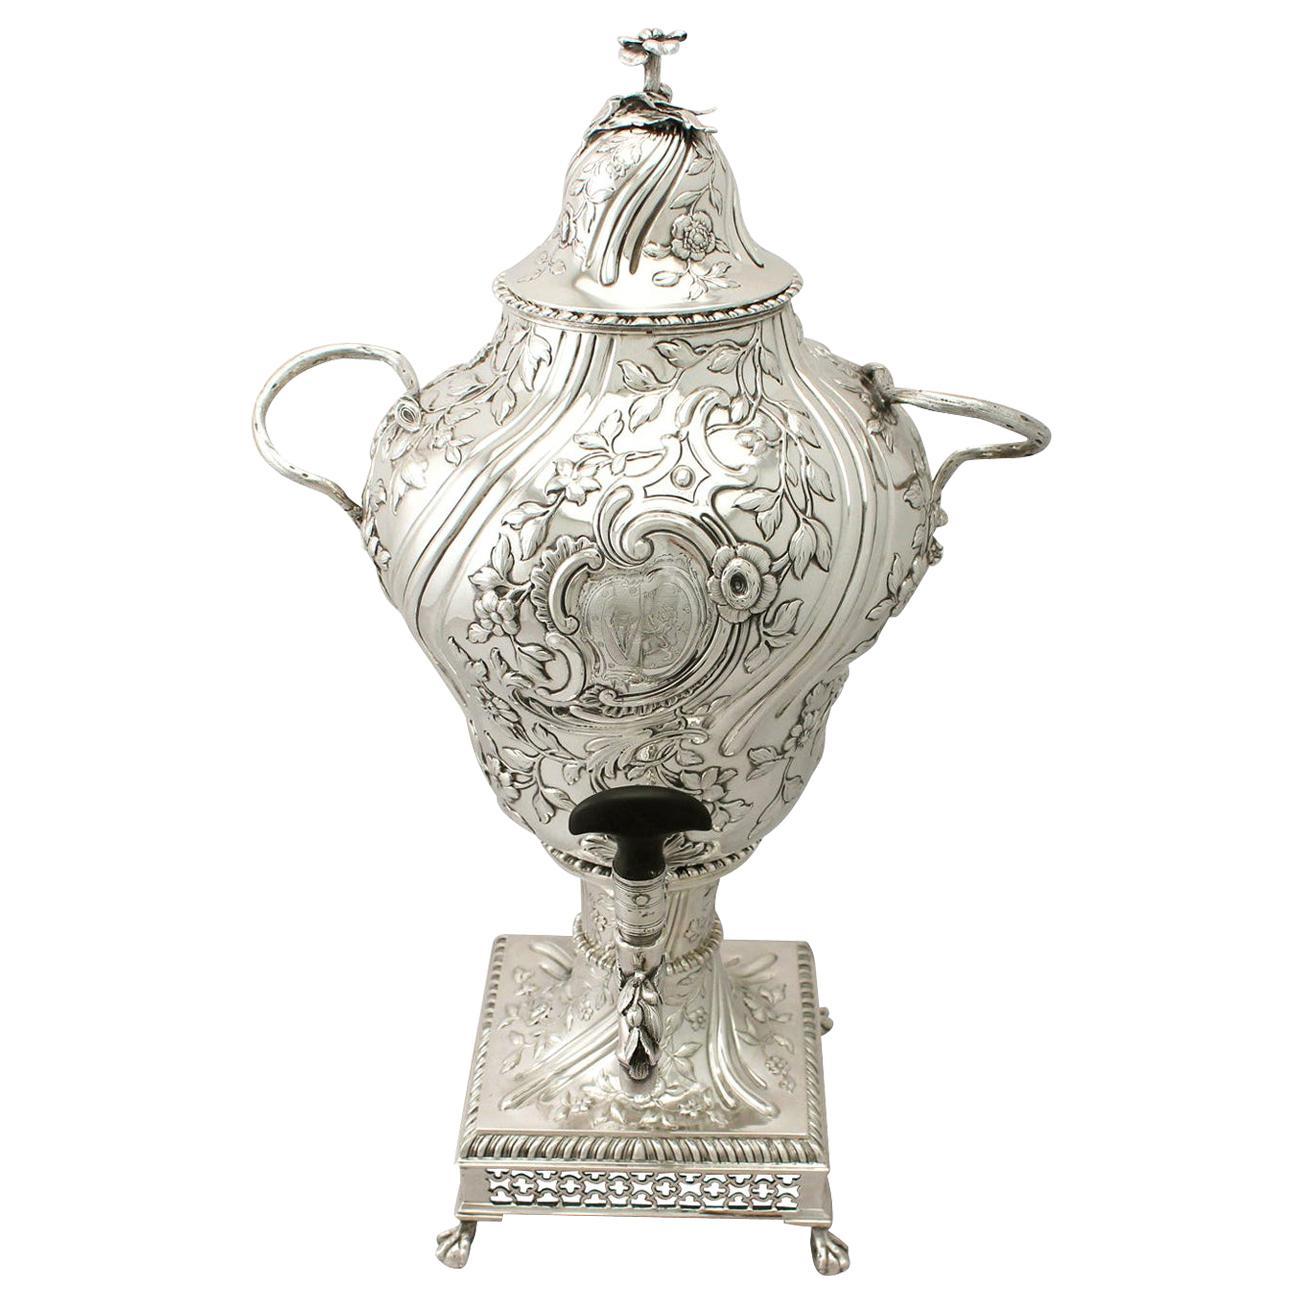 Antique George III Regency Style Sterling Silver Samovar